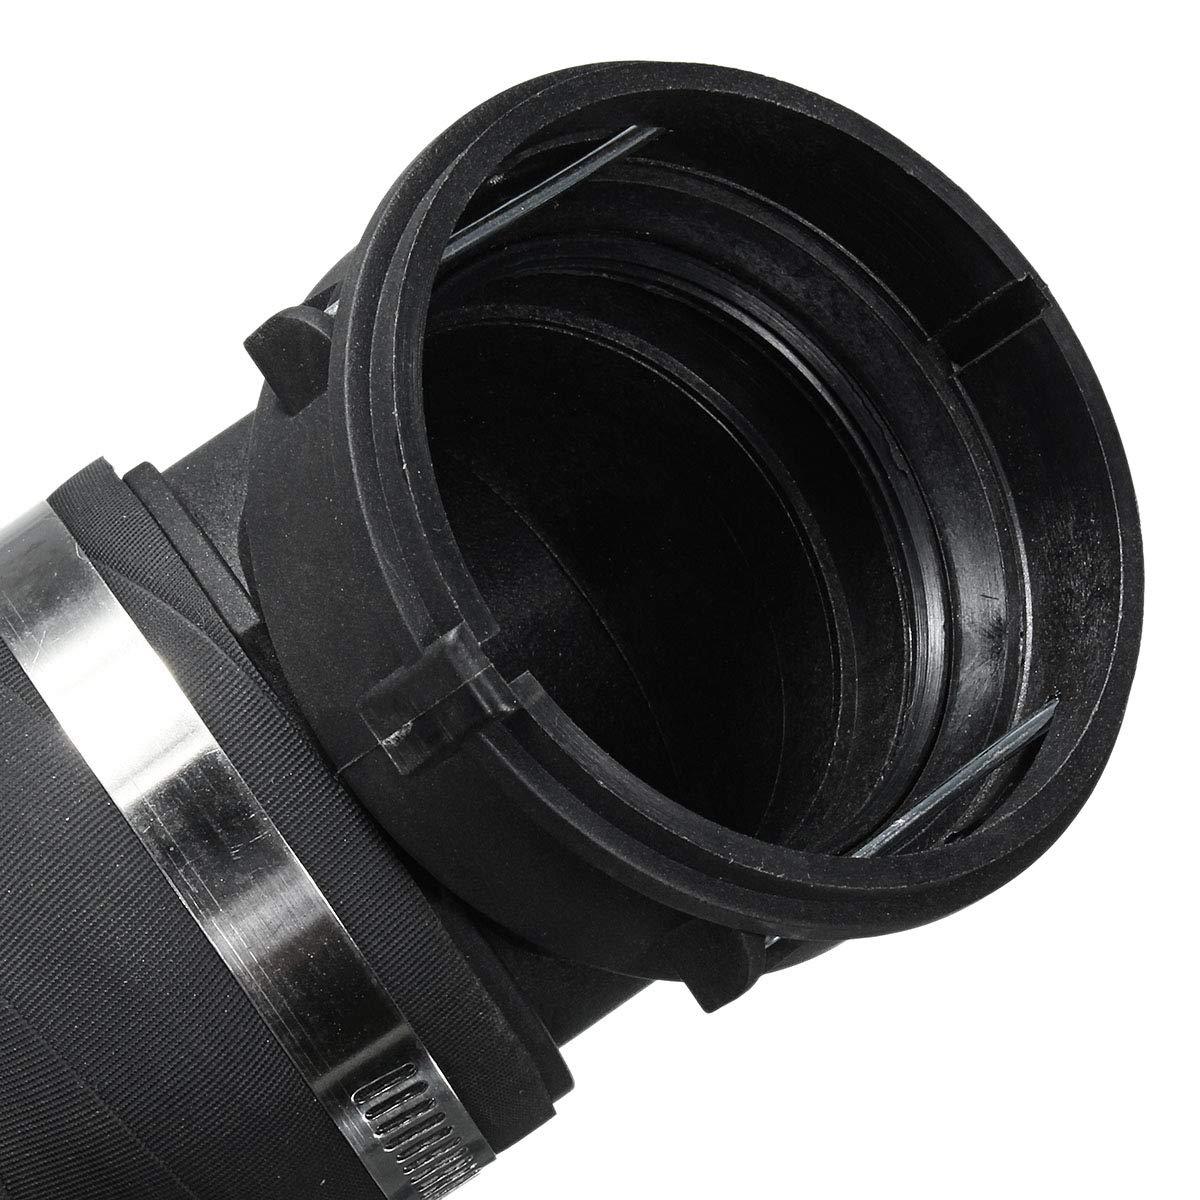 Binchil Manguera del Sistema de Enfriamiento del Autom/óVil Manguera Turbo para E60 E61 530D 11617799401 55100615